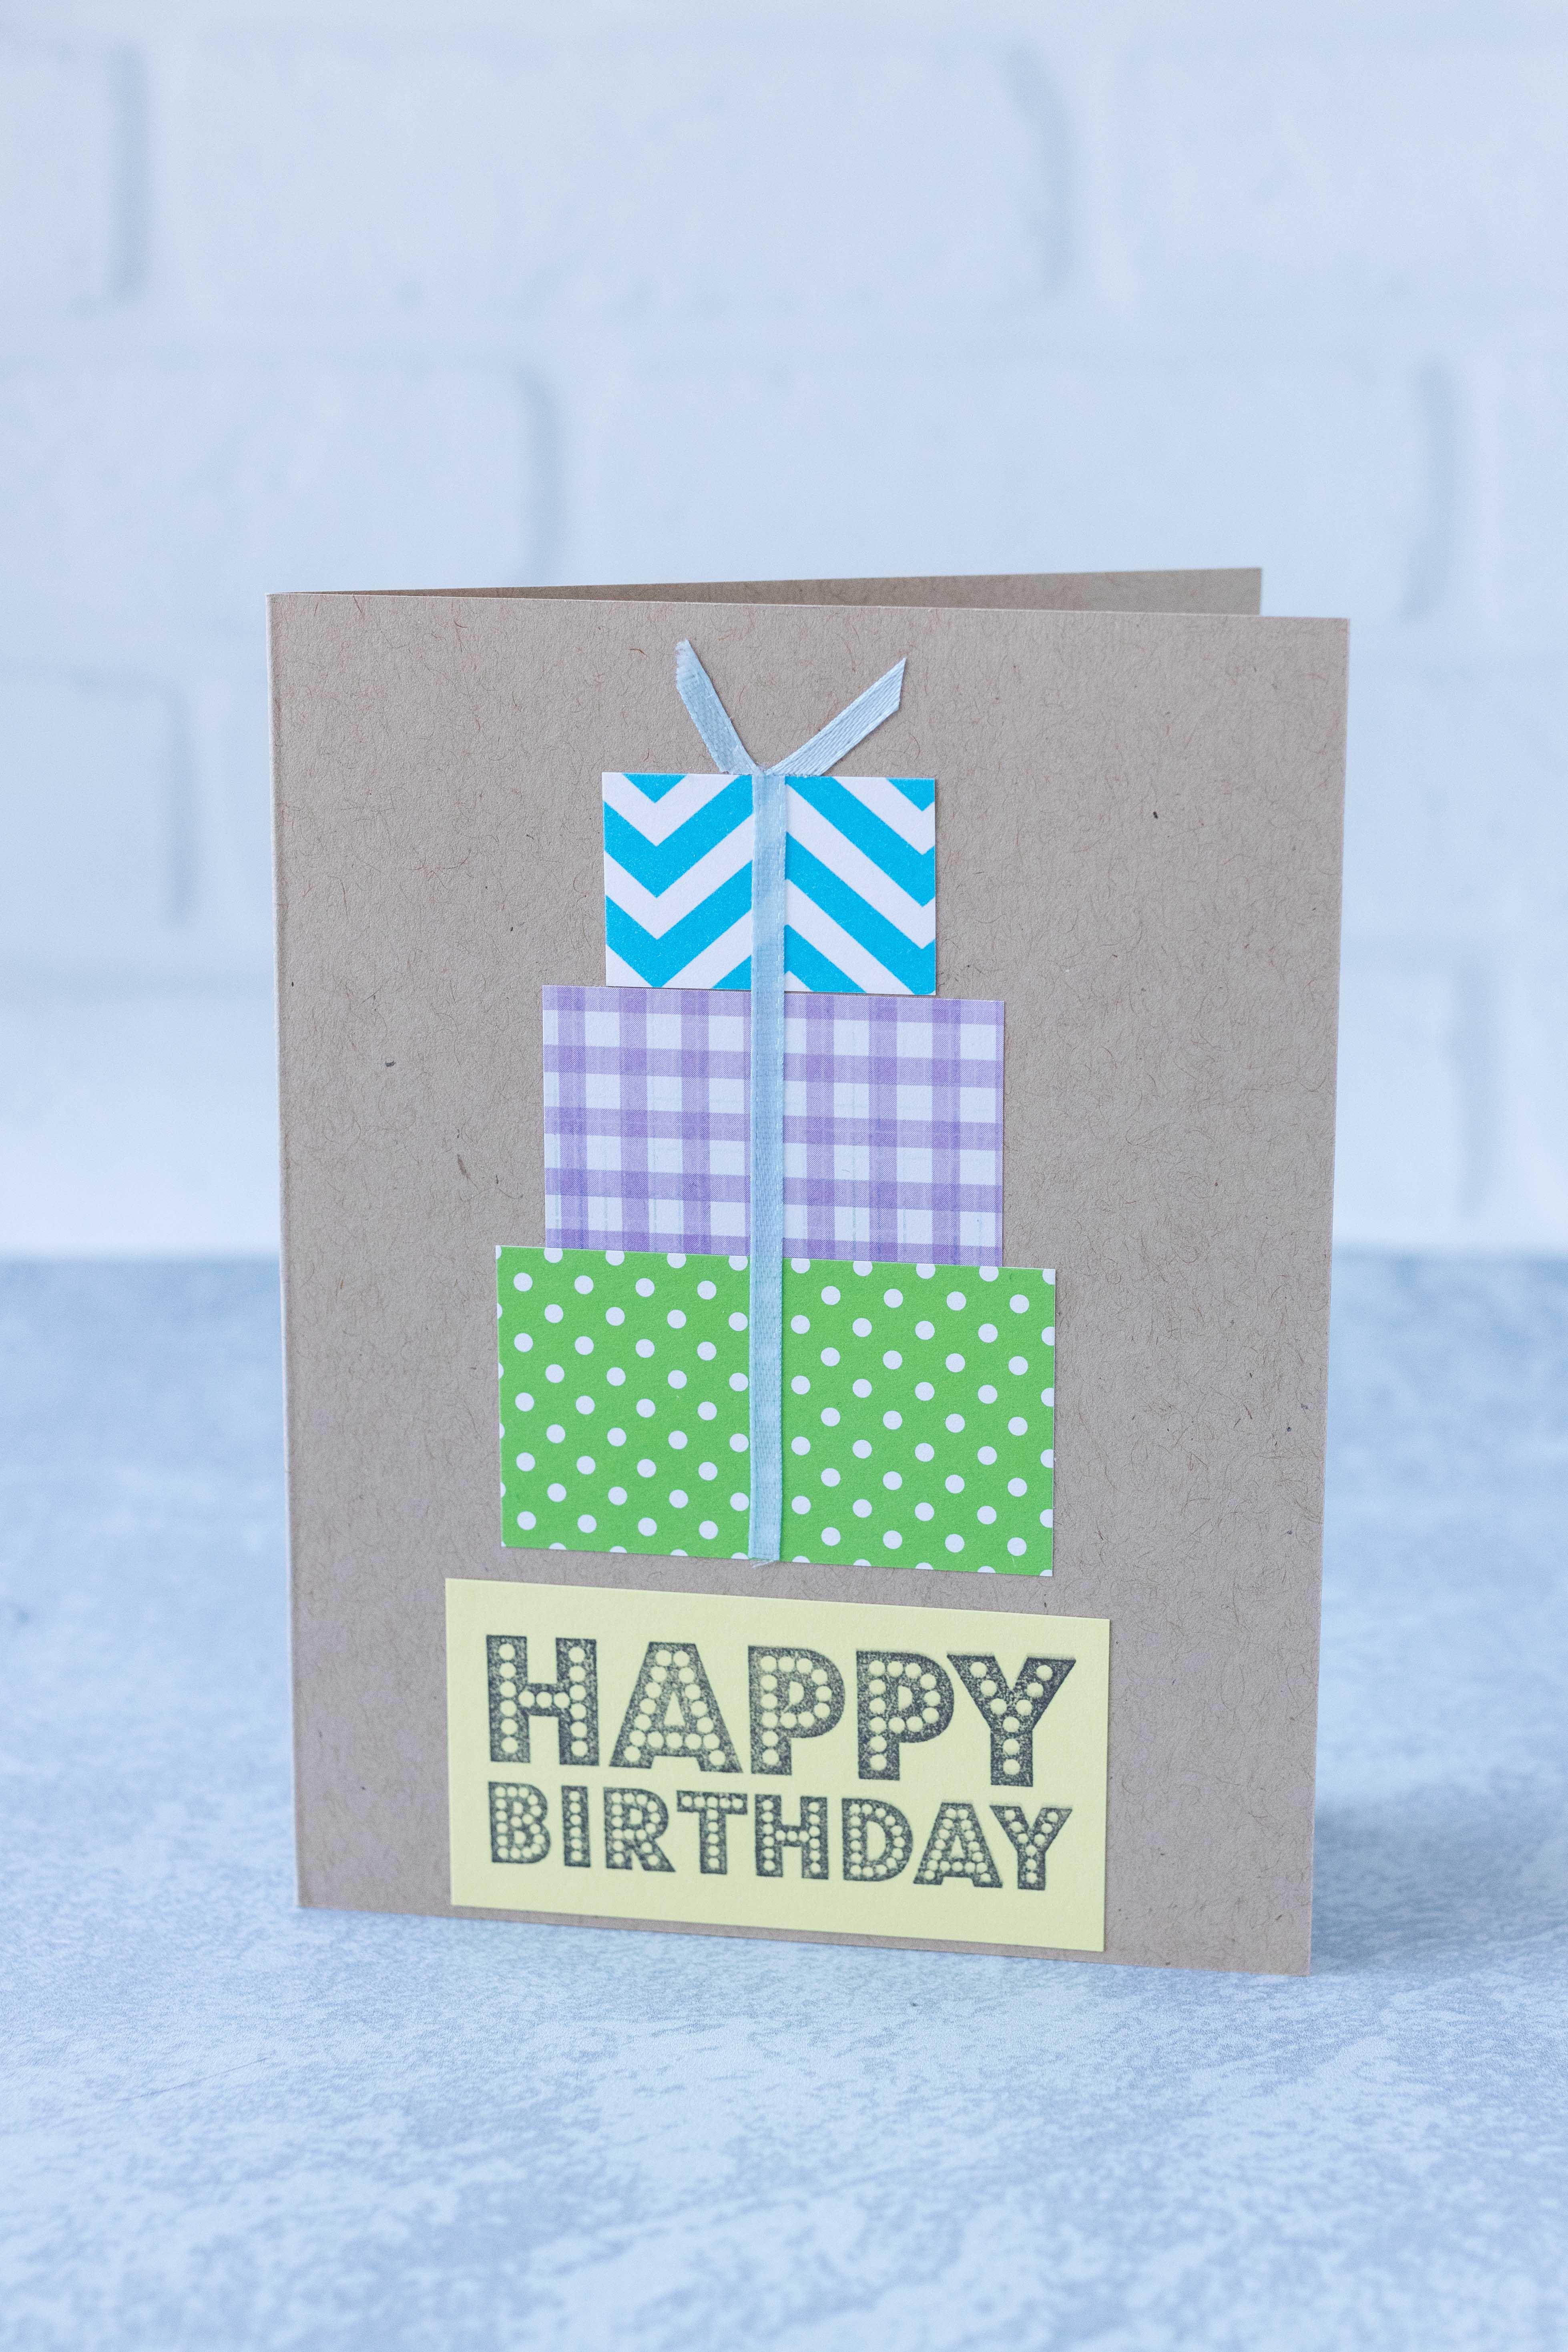 Handmade multicolored stacked presents birthday card @randomcreative #DIY #birthdaycard #handmadecardidea | https://www.roseclearfield.com